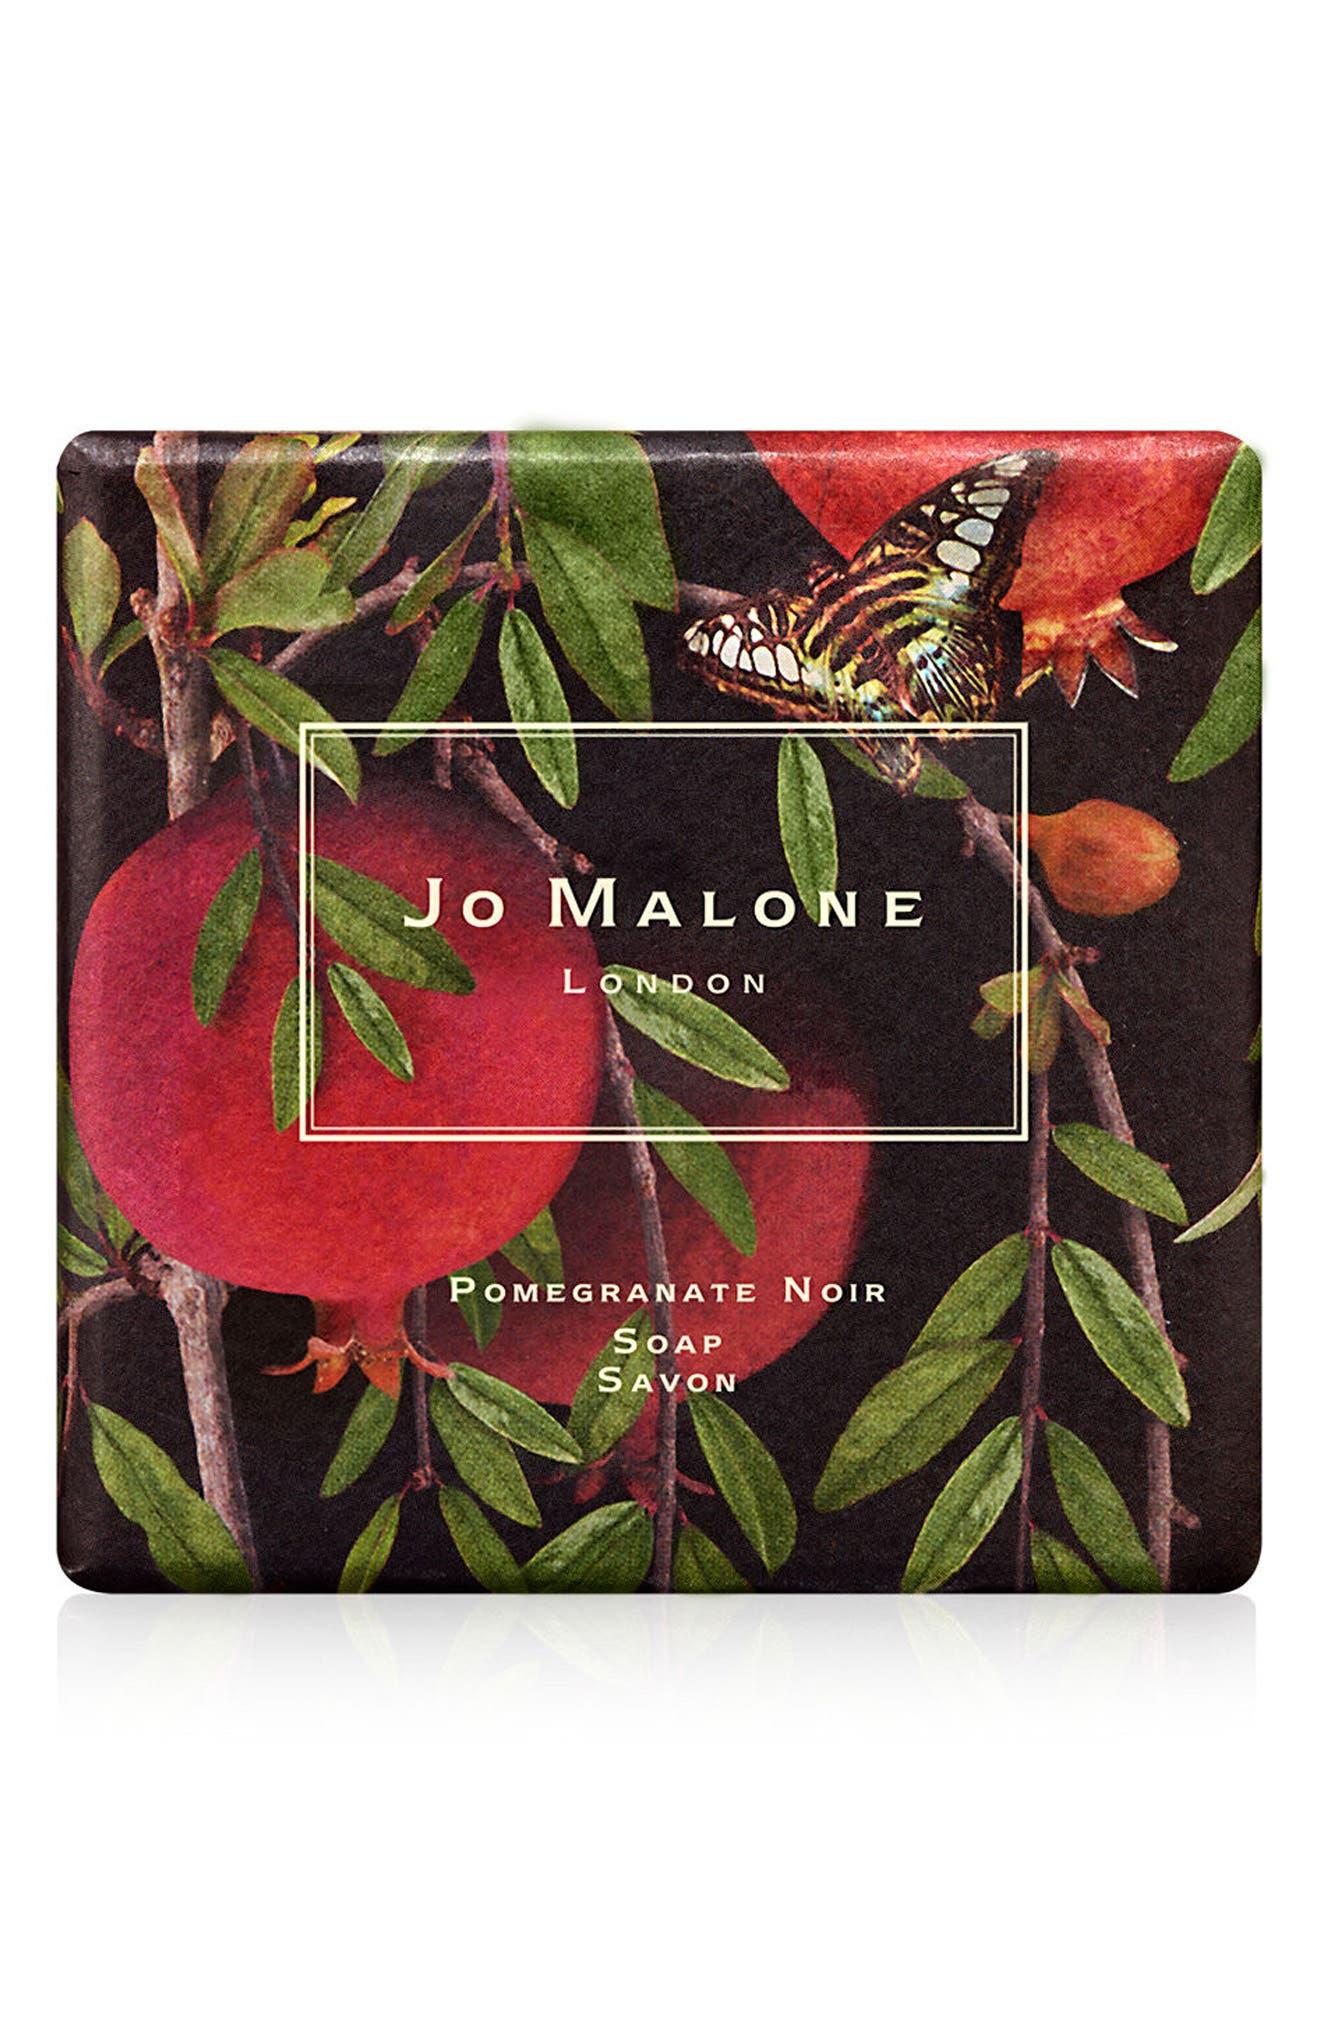 Jo Malone London(TM) Pomegranate Noir Soap